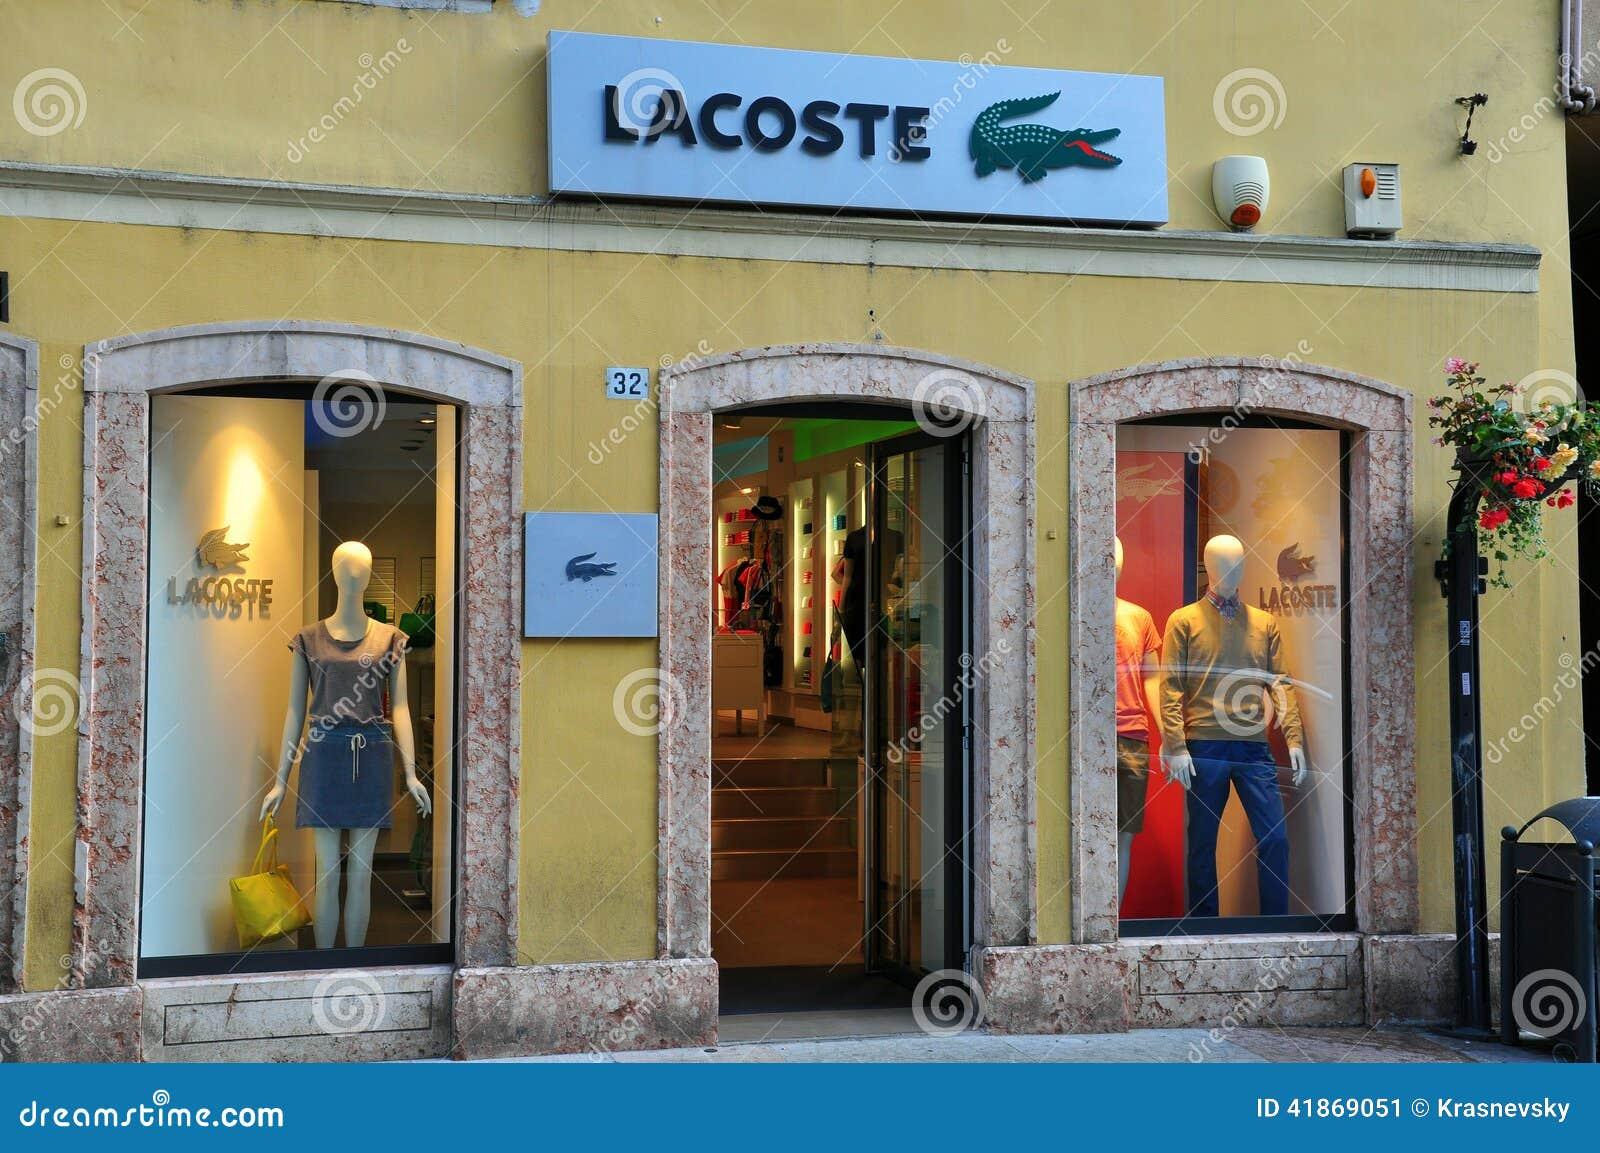 Nba clothing store